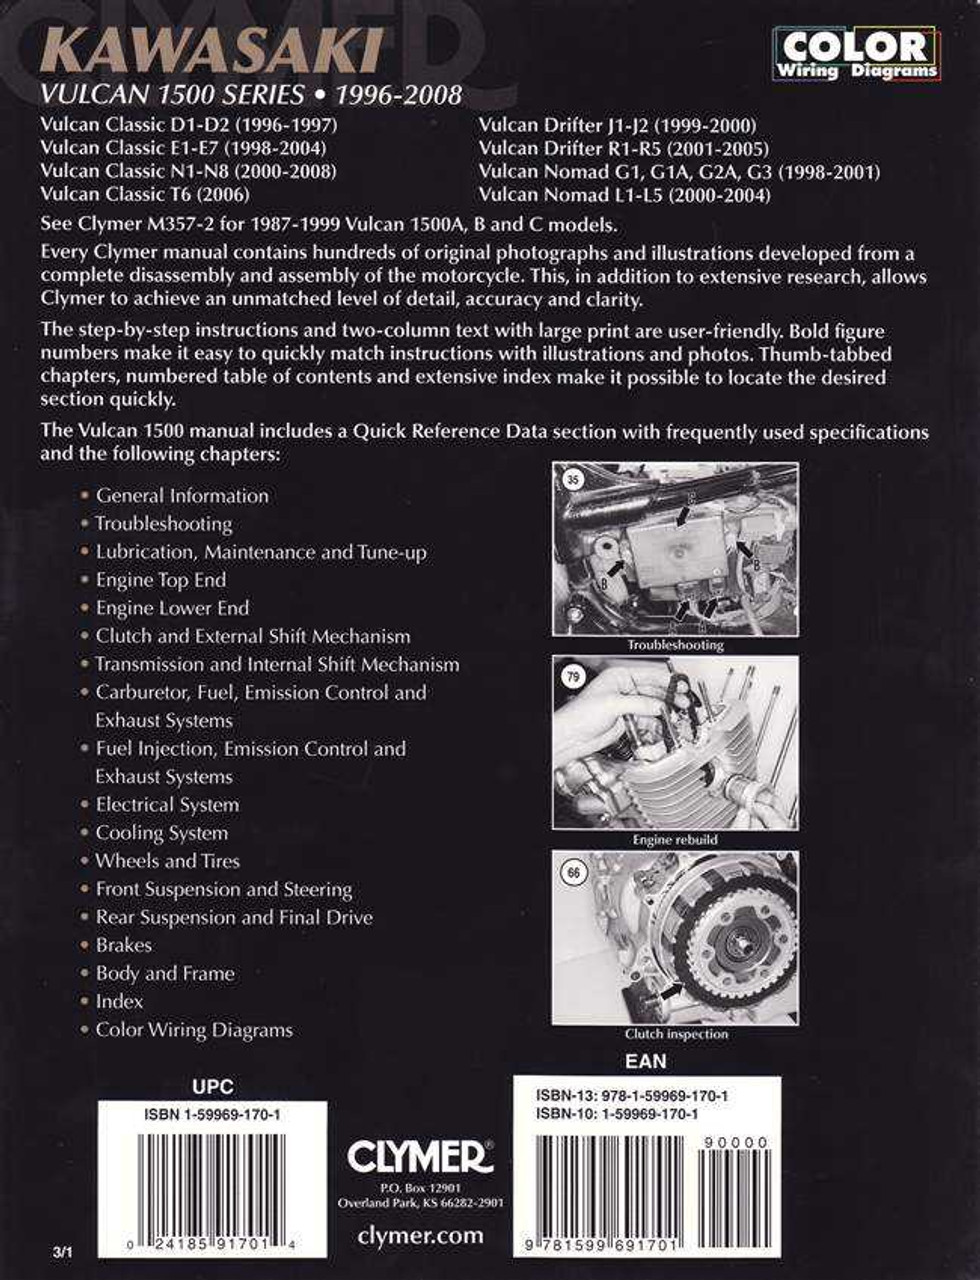 Kawasaki Vulcan 1500 Series Clic, Drifter, Nomad 1996 - 2008 Workshop on